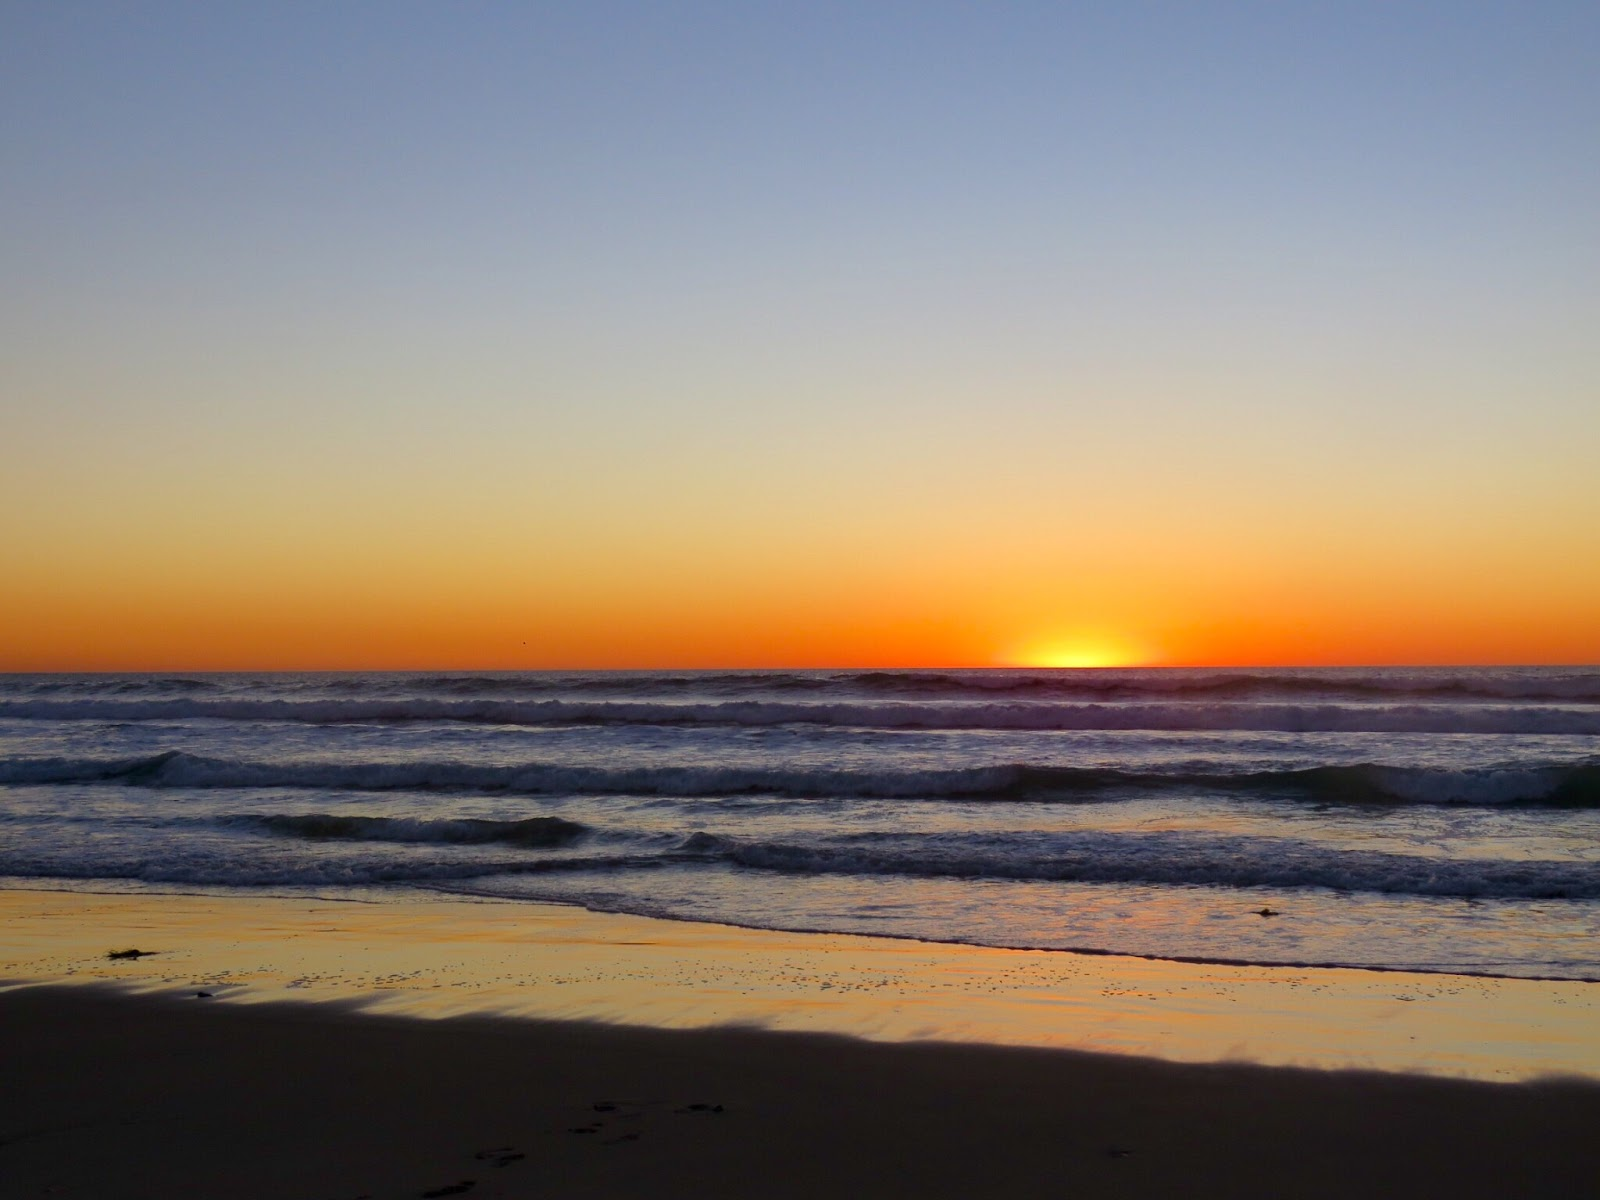 sunset beach san - photo #13